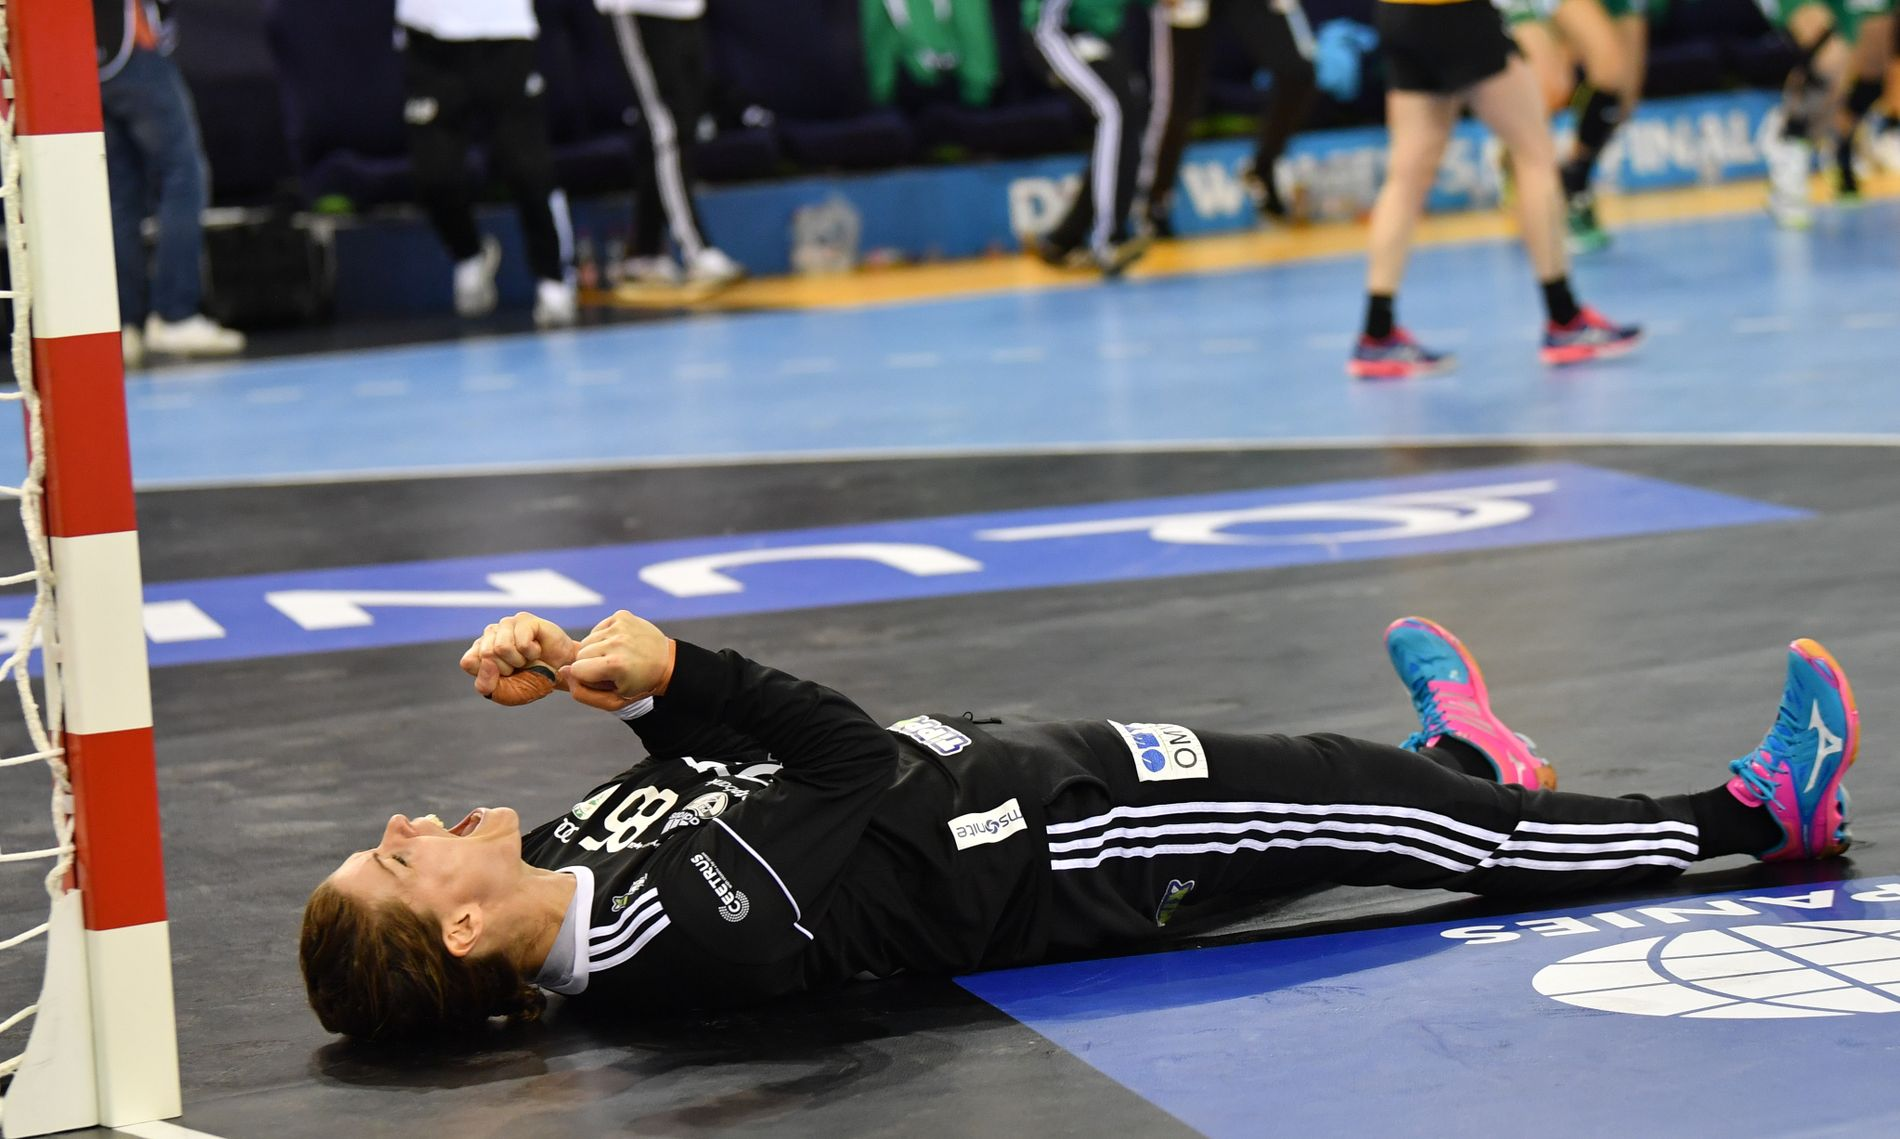 MATCHVINNER: Kari Aalvik Grimsbø jublet liggende over redningen som sikret tittelen i Champions League.